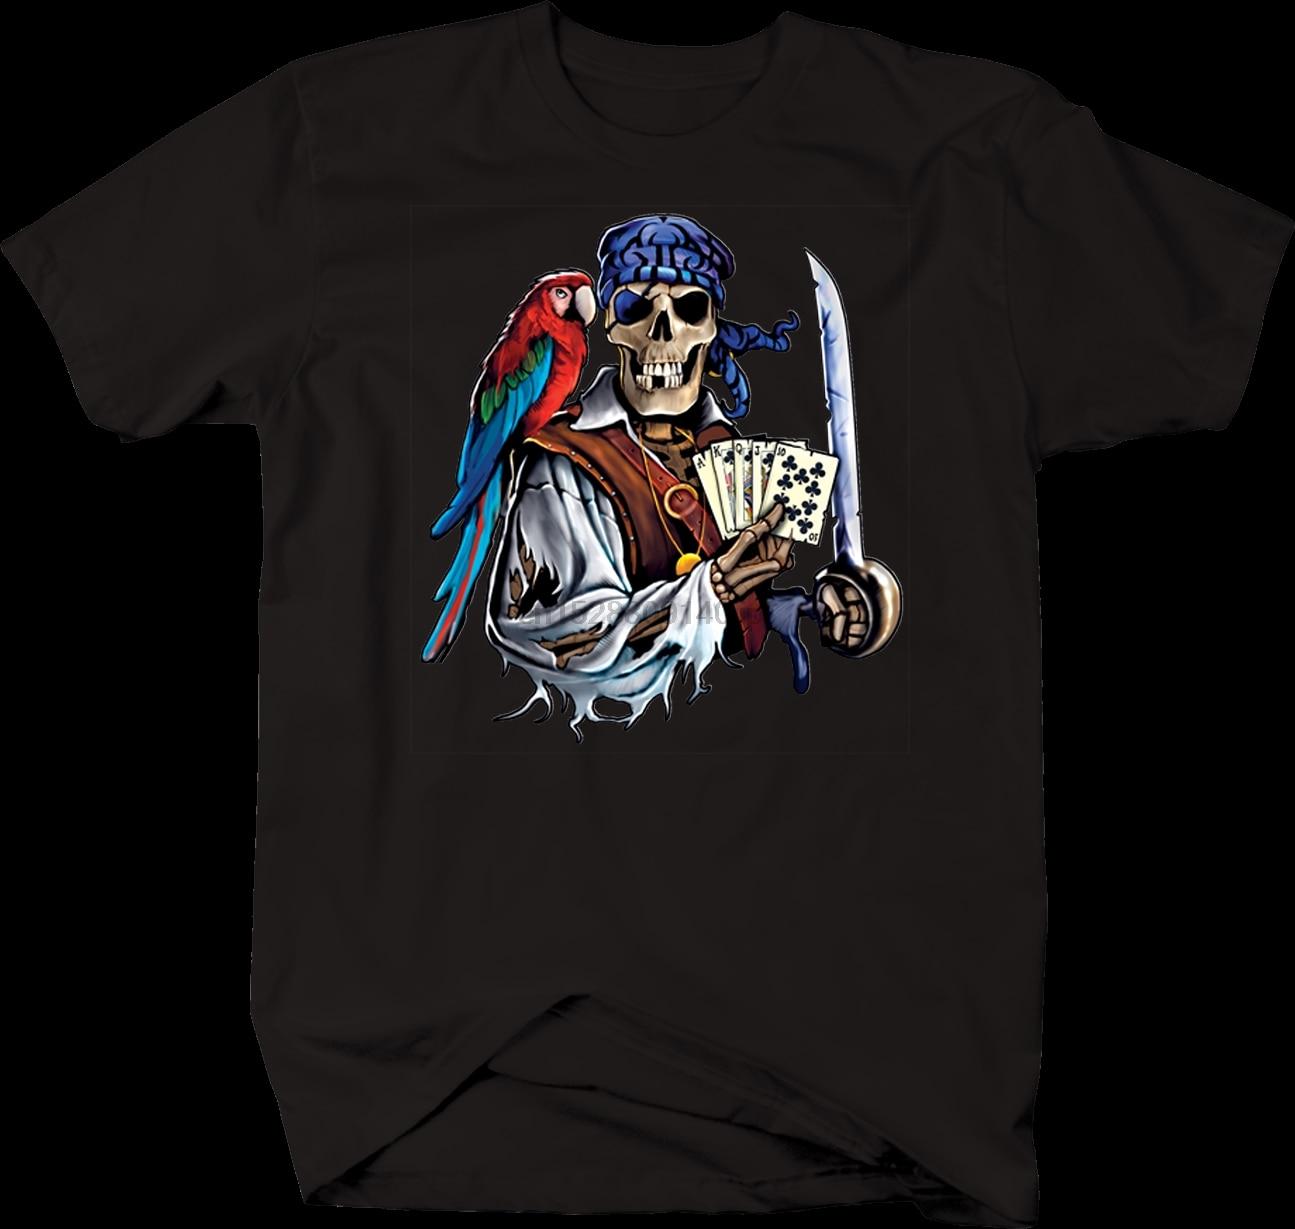 Pirata skelton segurando cartas de jogo e espada papagaio ouro tshirt